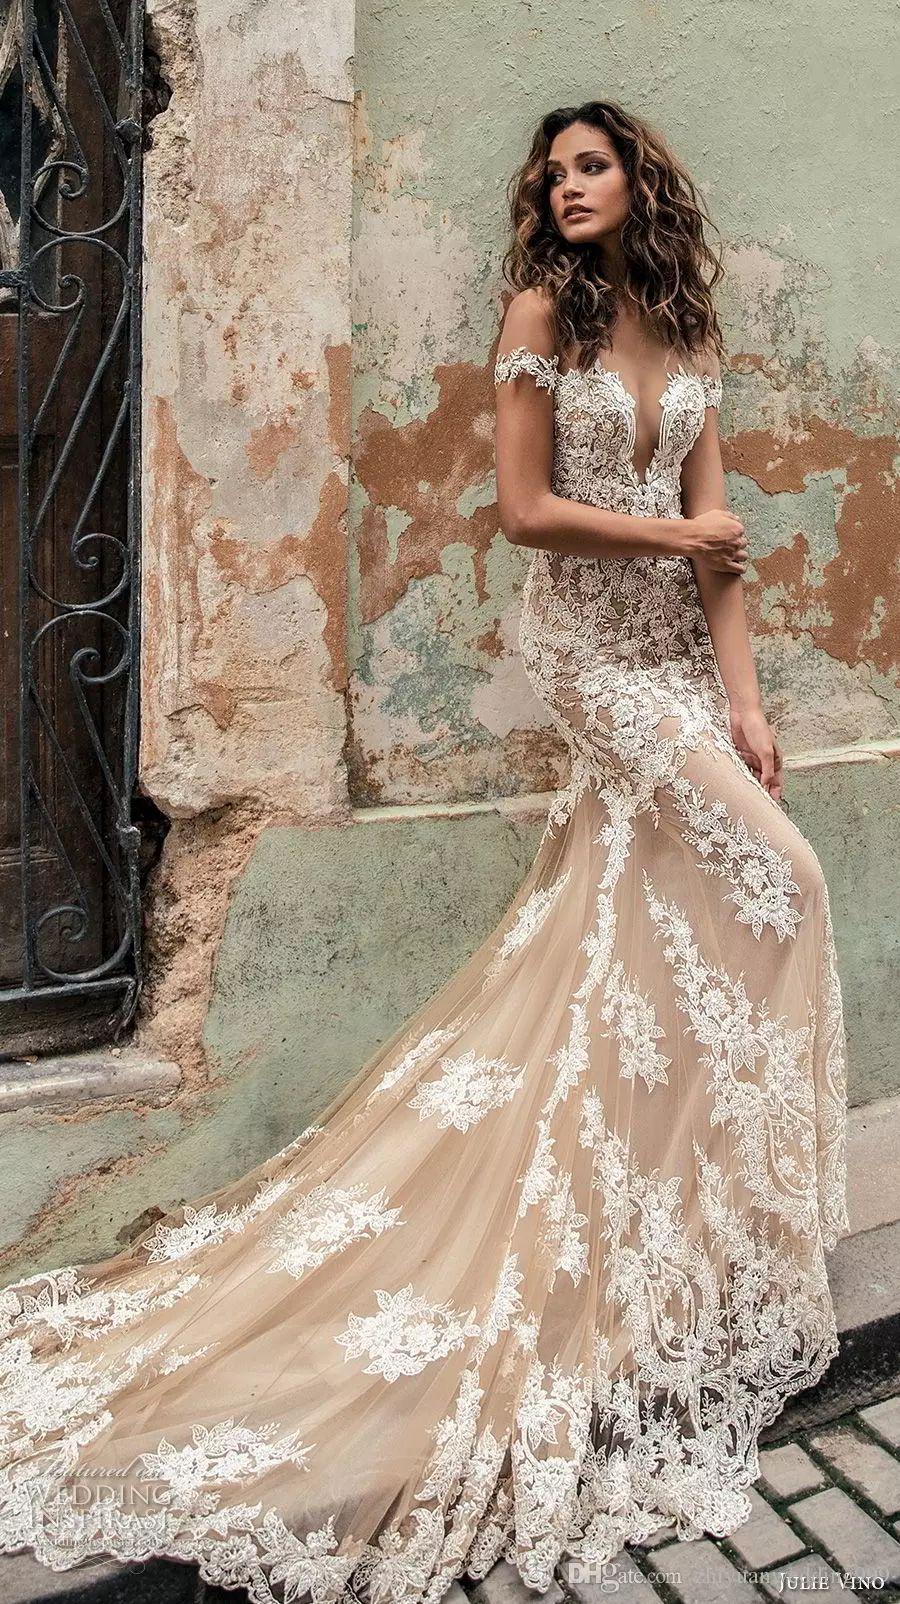 Champagne Julie Vino Wedding Dresses 2020 Off Shoulder Deep Plunging Neckline Bridal Gowns Sweep Train Lace Wedding Dress Custom Made